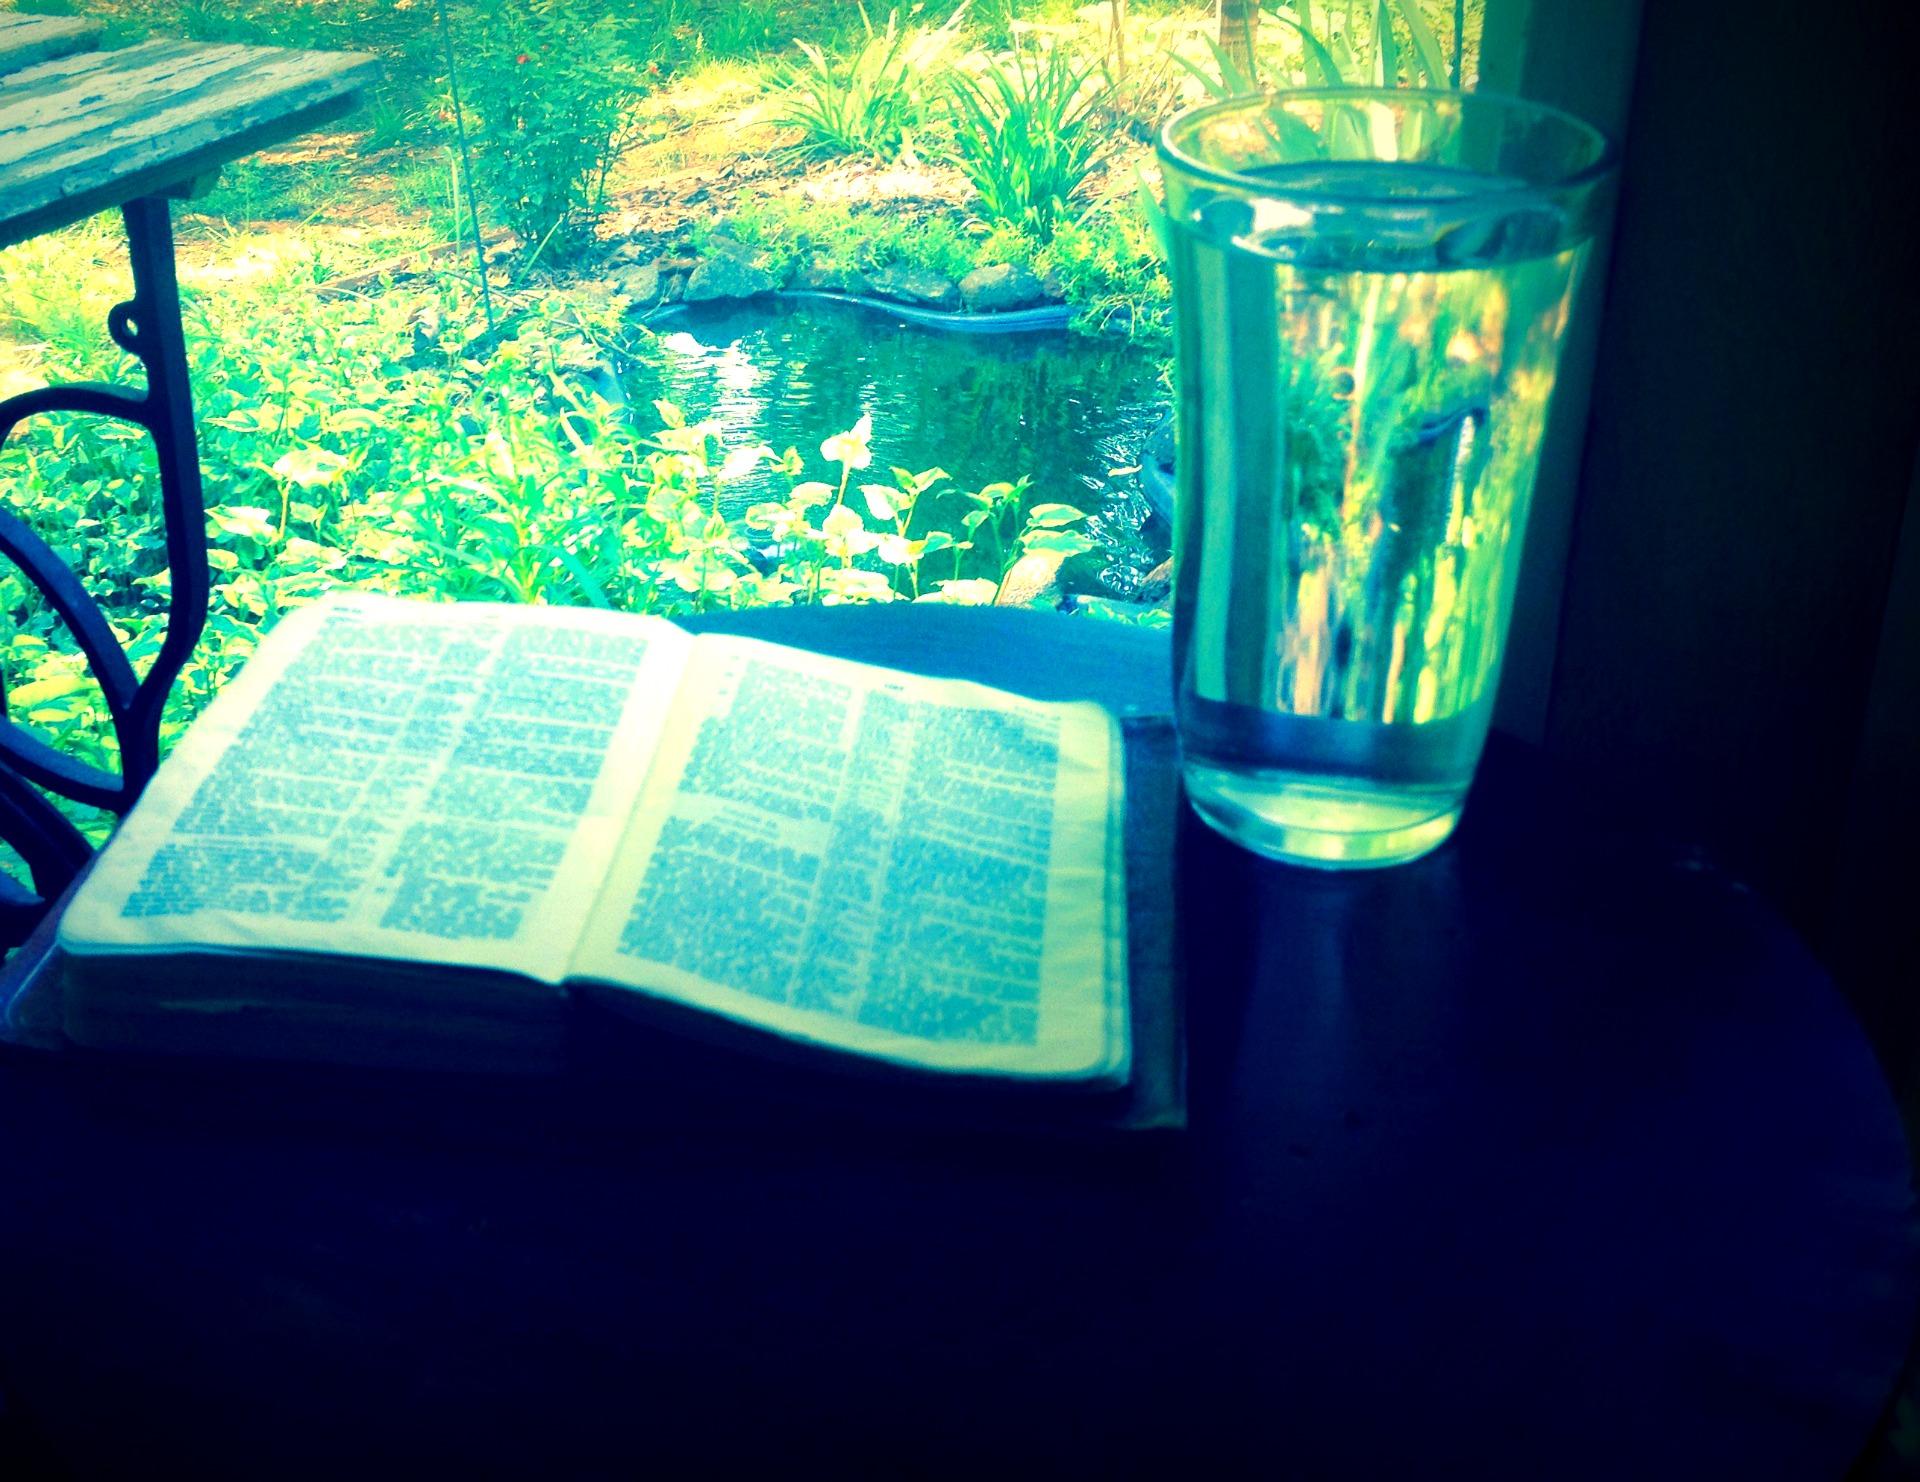 BibleHeader